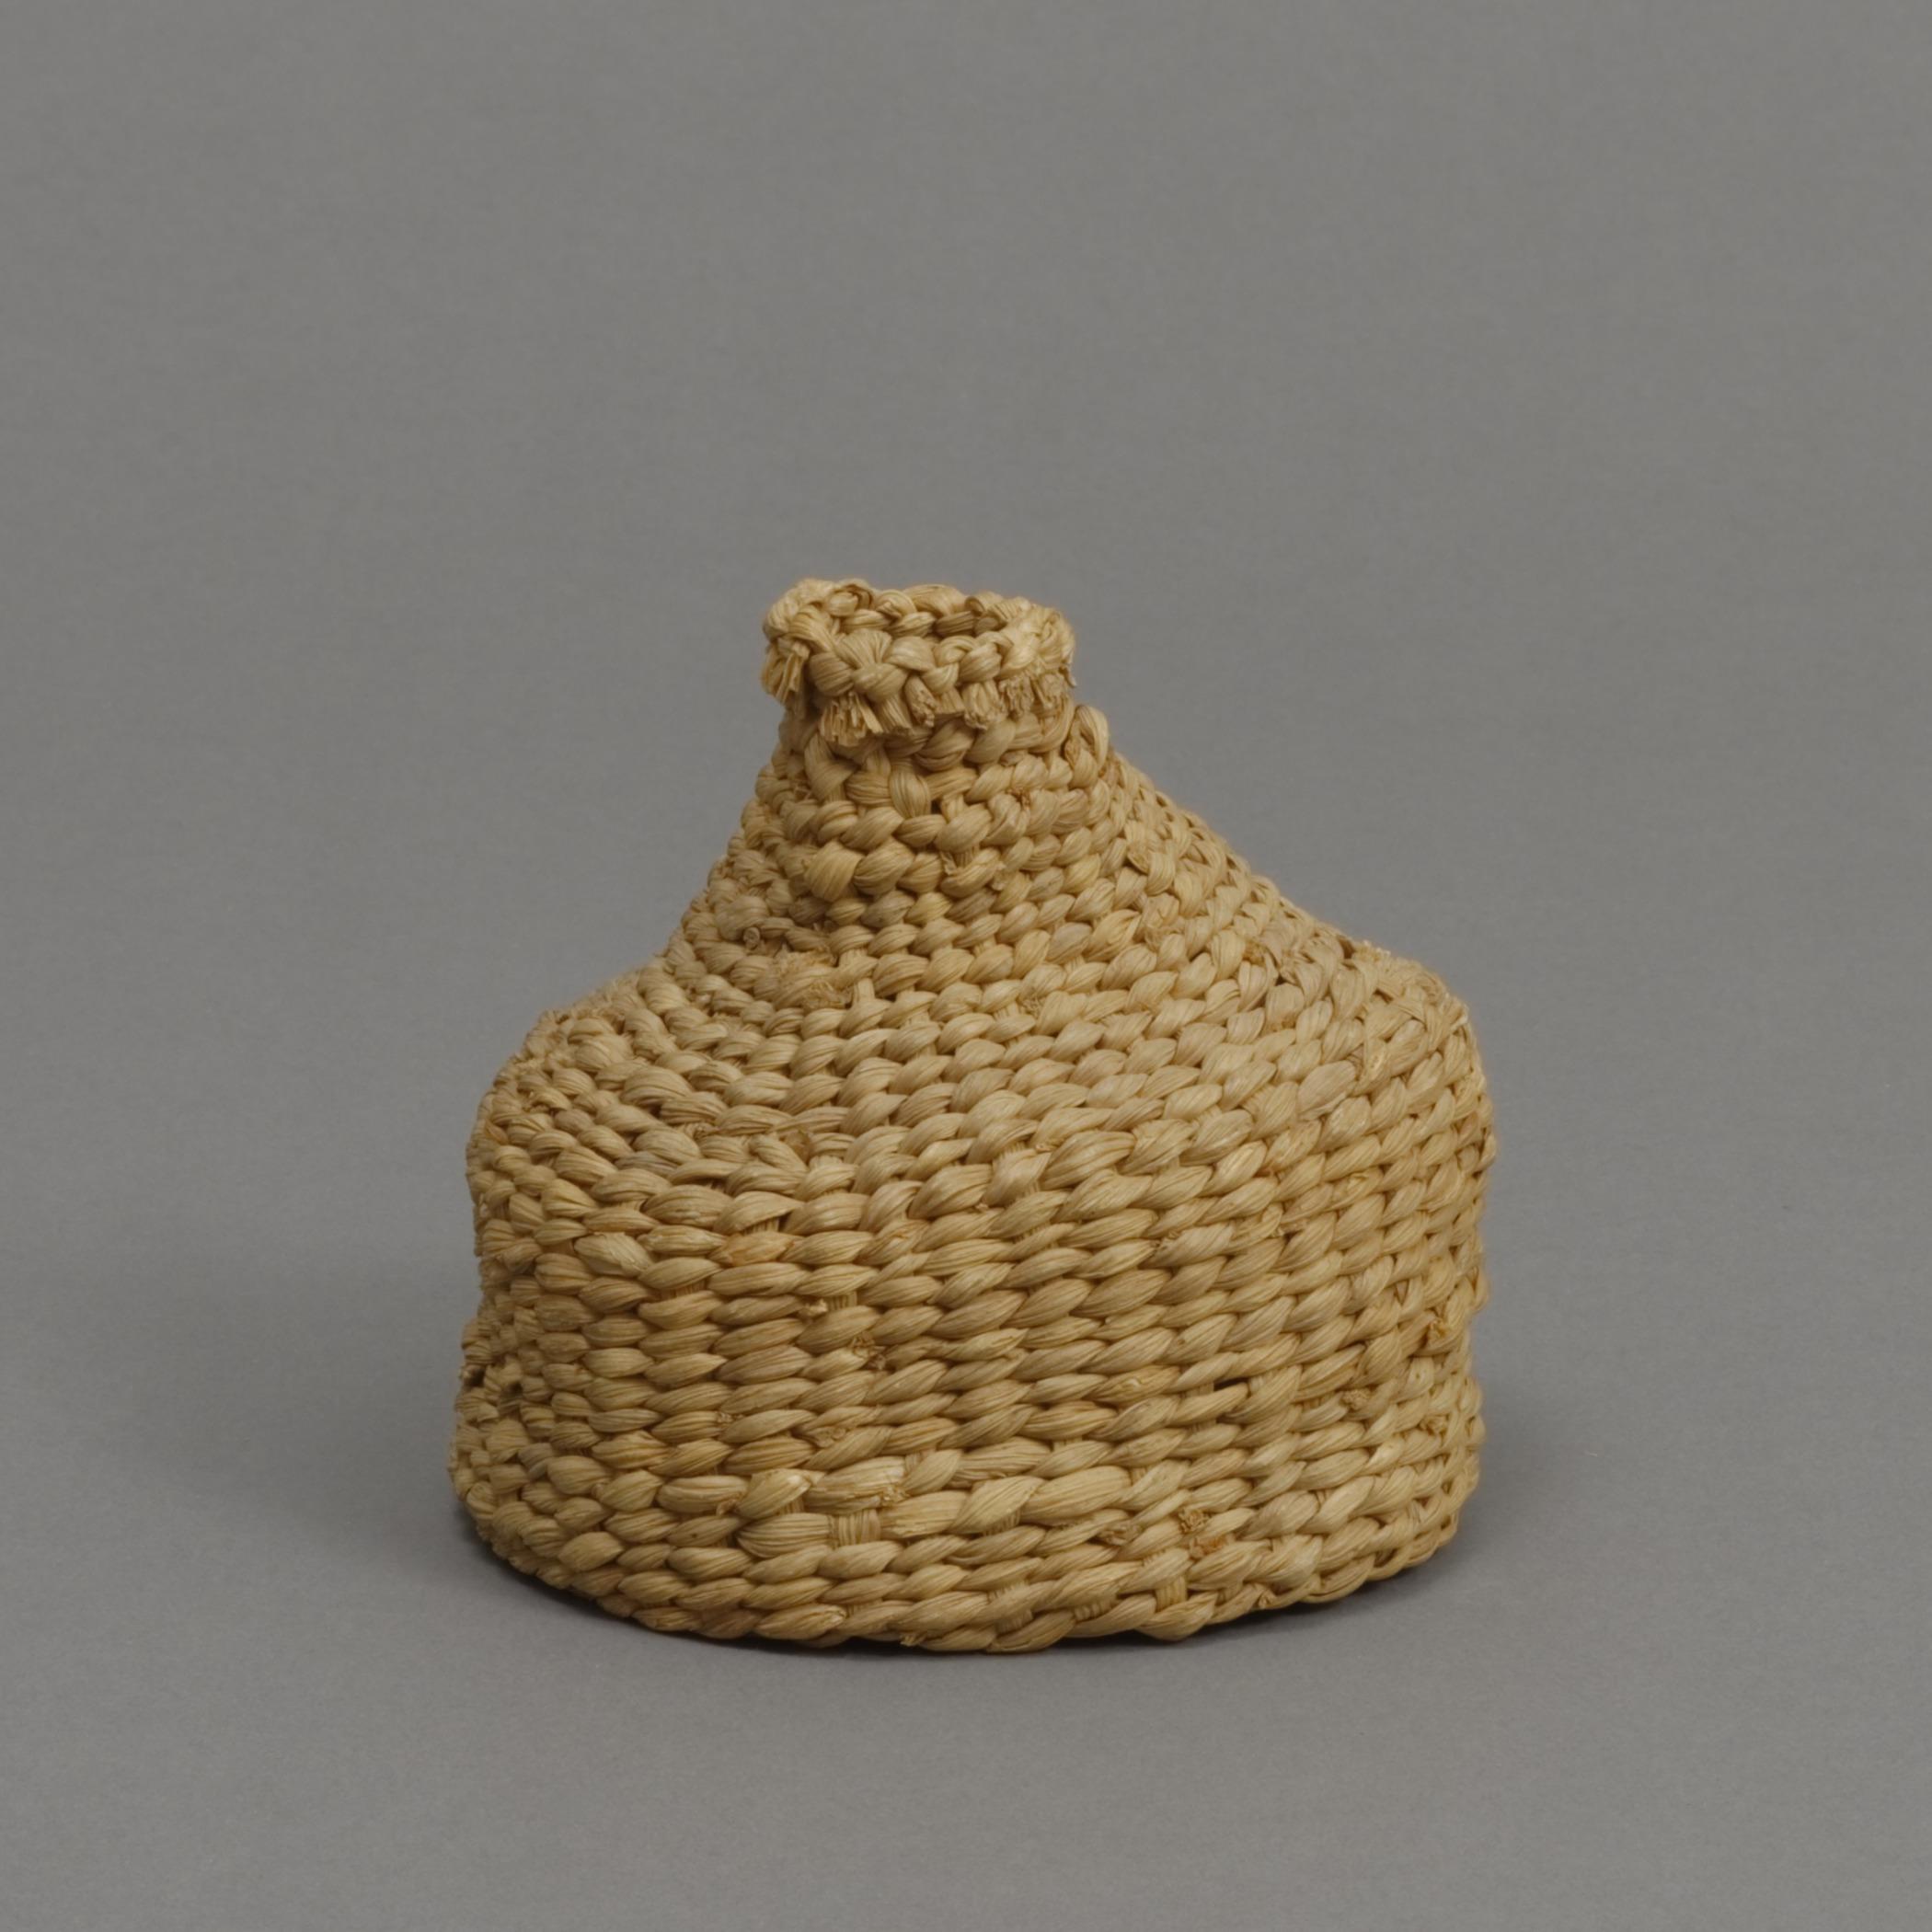 Haudenosaunee (Iroquois), braided corn husk salt bottle basket (stopper missing), late 19th century. Corn husk, 4 × 4 7/16 in.   Hood Museum of Art, Dartmouth College: Gift of Mrs. Ida Farr Miller; 44.18.8748.